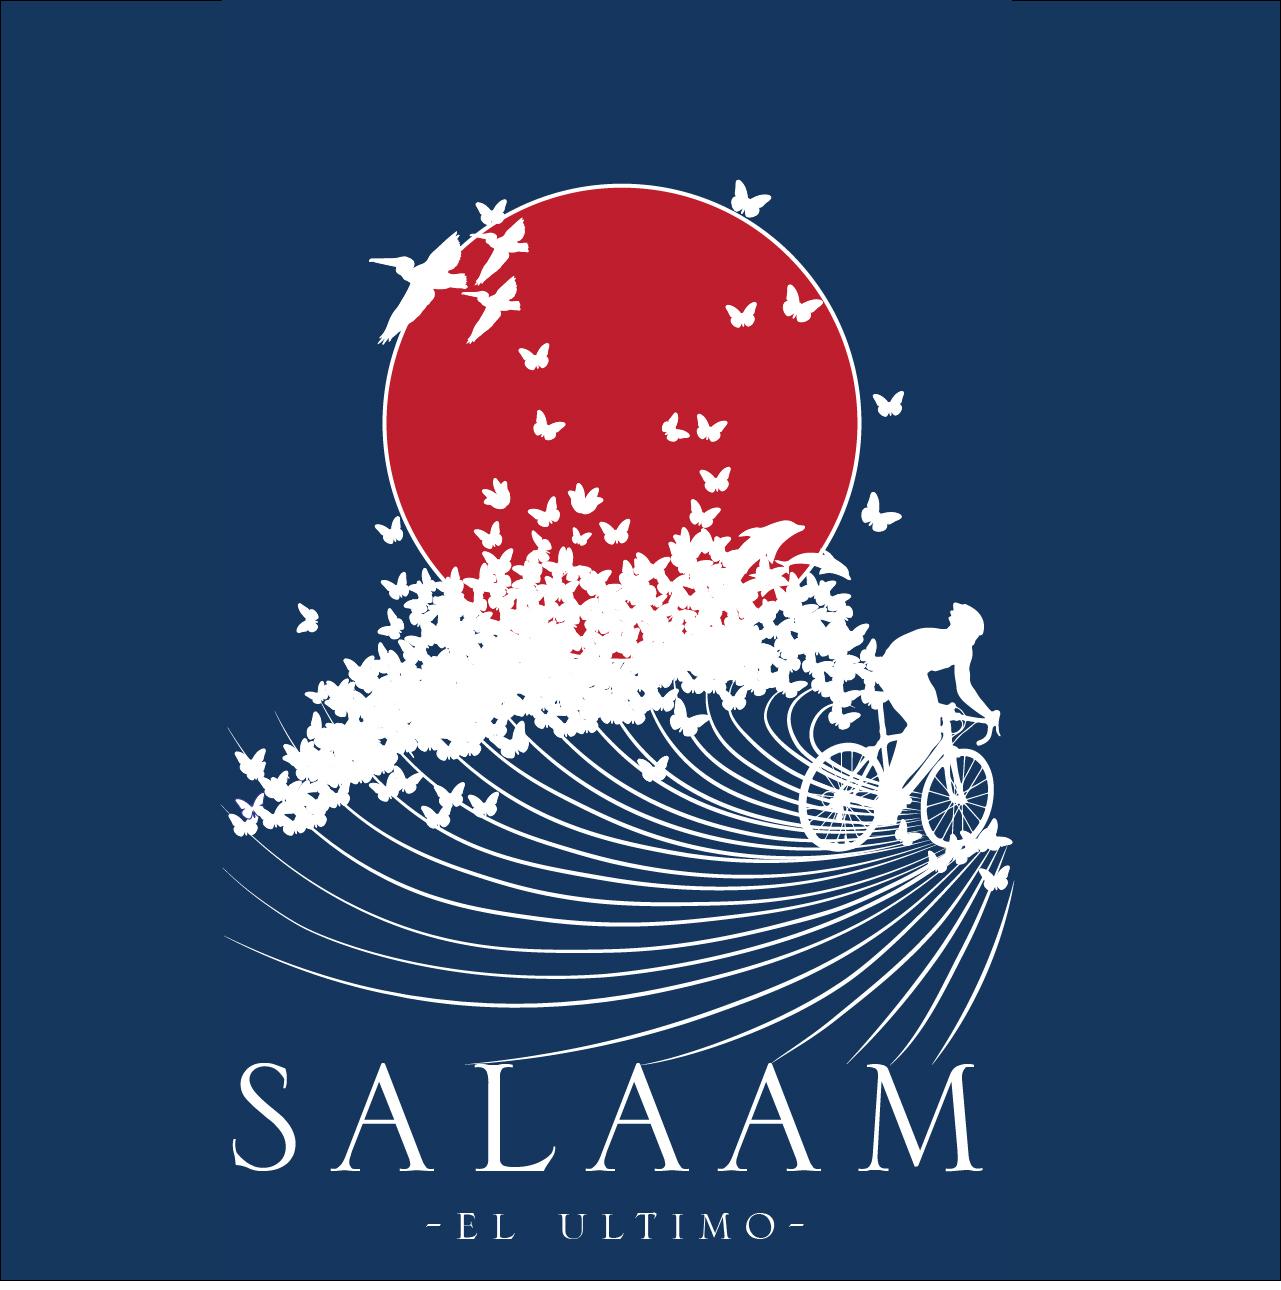 SALAAM TRIATHLON | logo for tees, towels